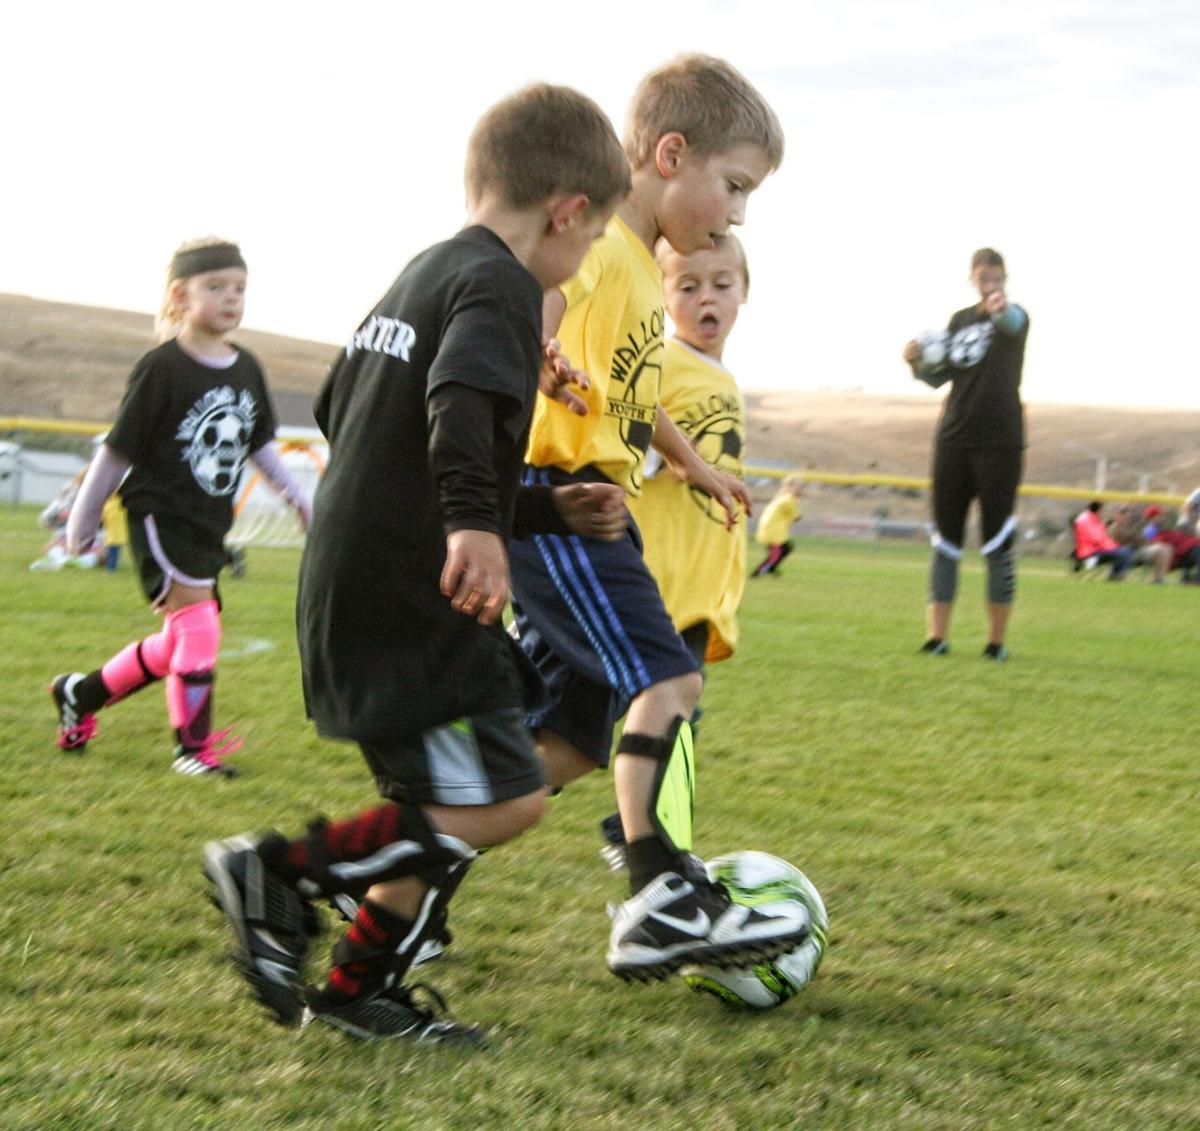 Kids SoccerBoys & ball